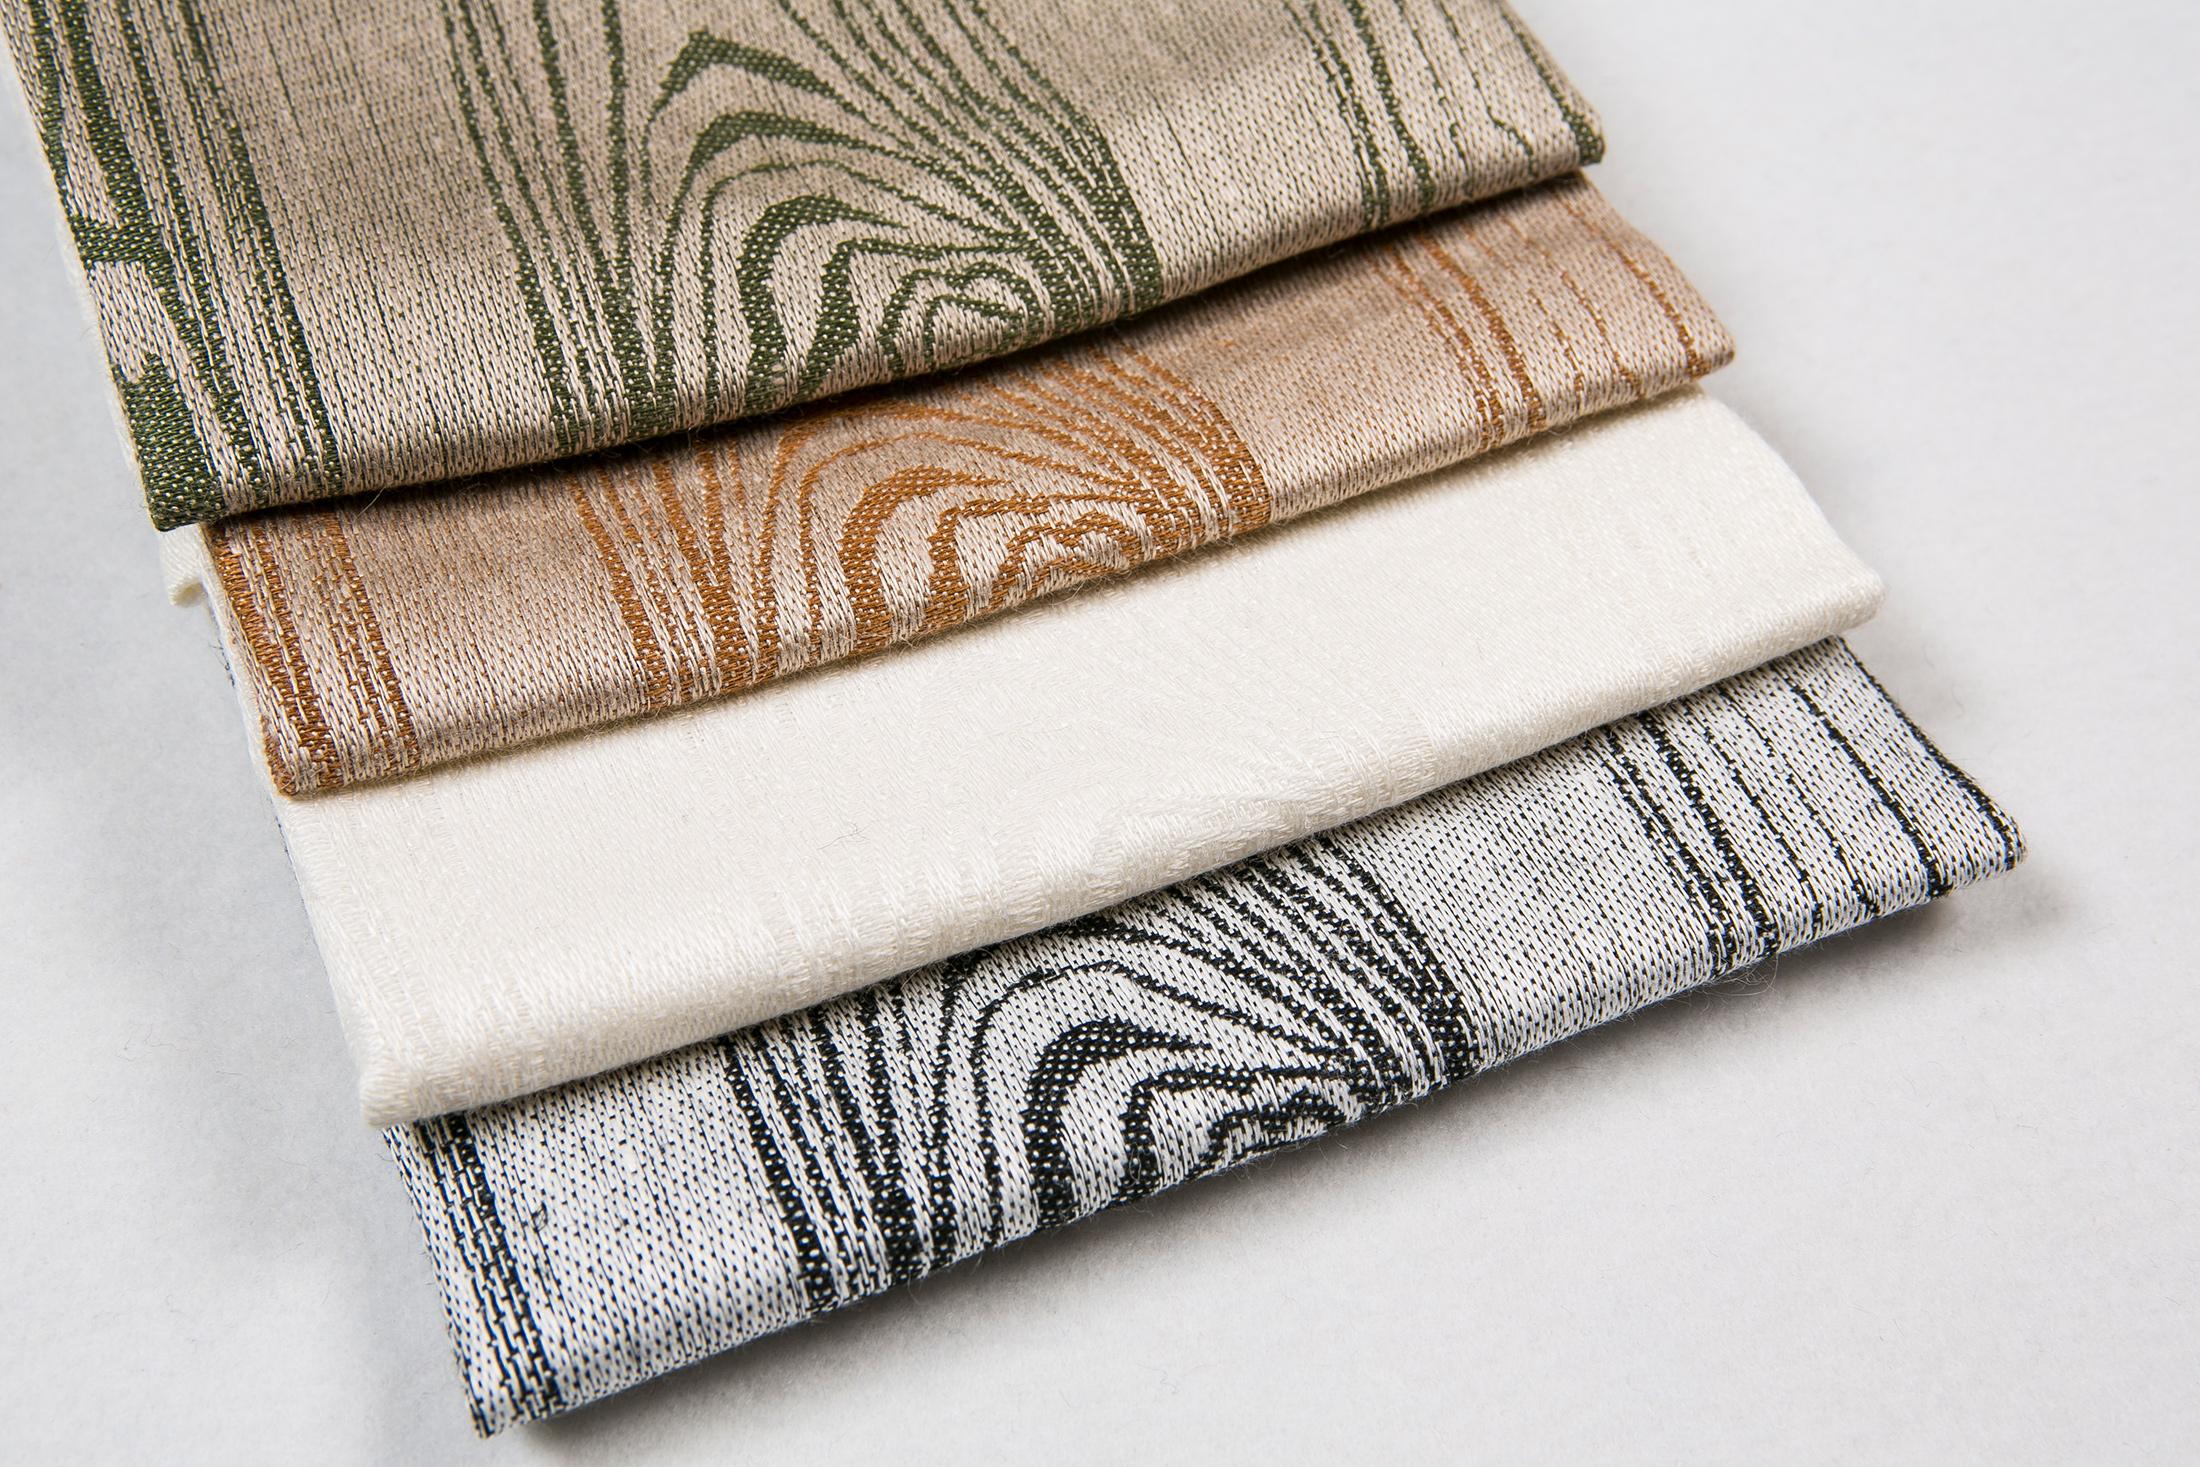 Tilja-viskestykke-hørhåndklæde-klassbols-linned